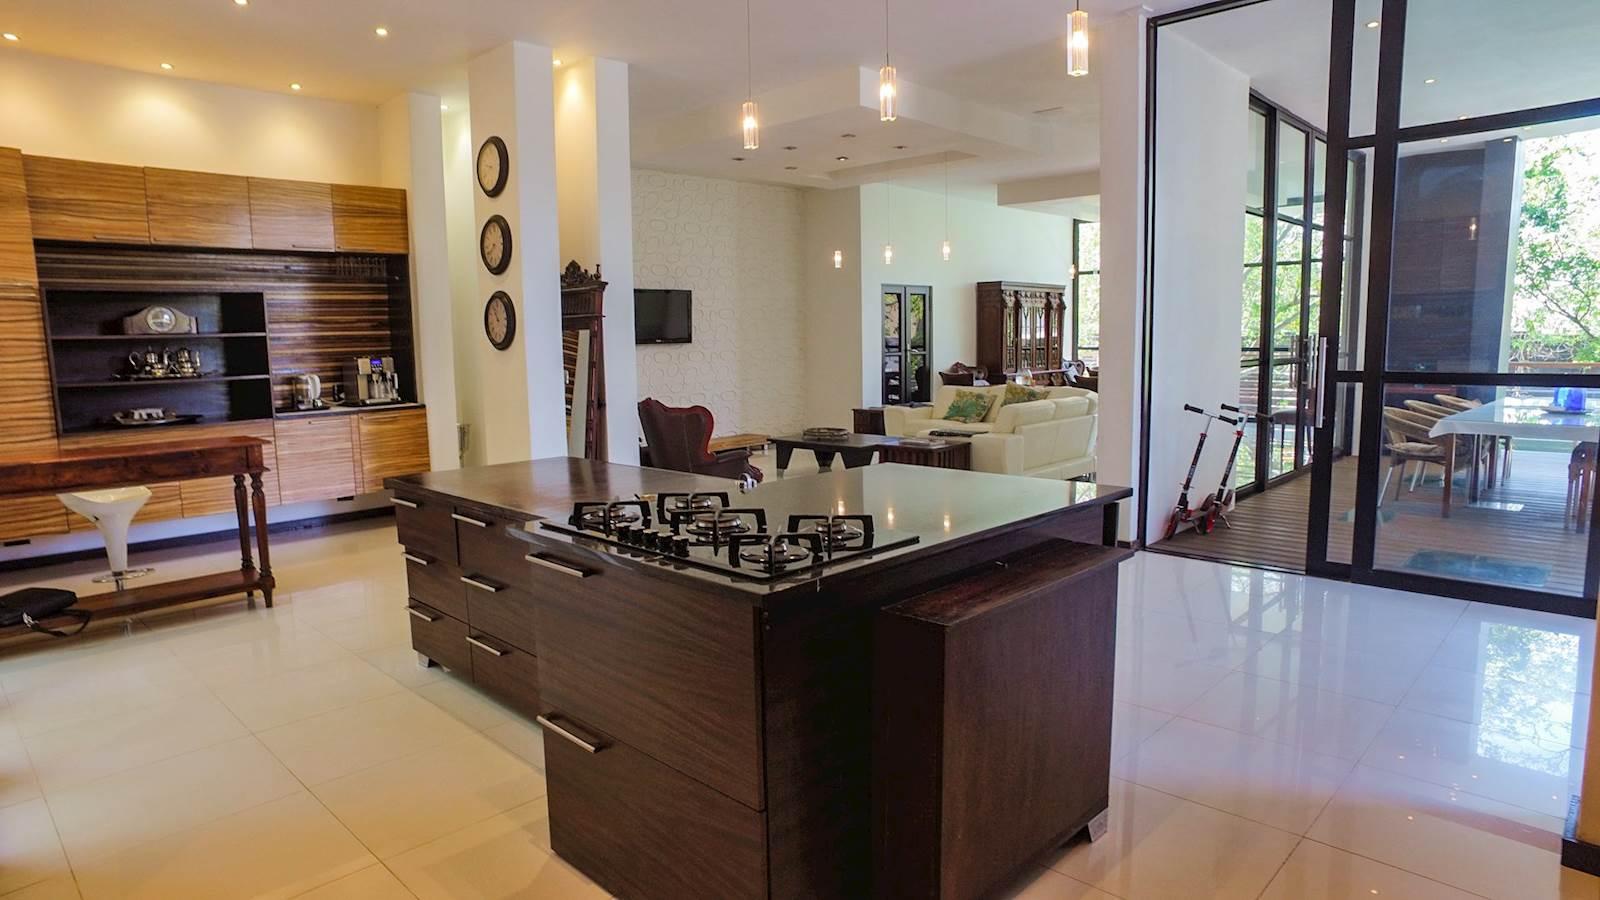 3 Bedroom House sold in Waterkloof Ridge ENT0010698 : photo#1